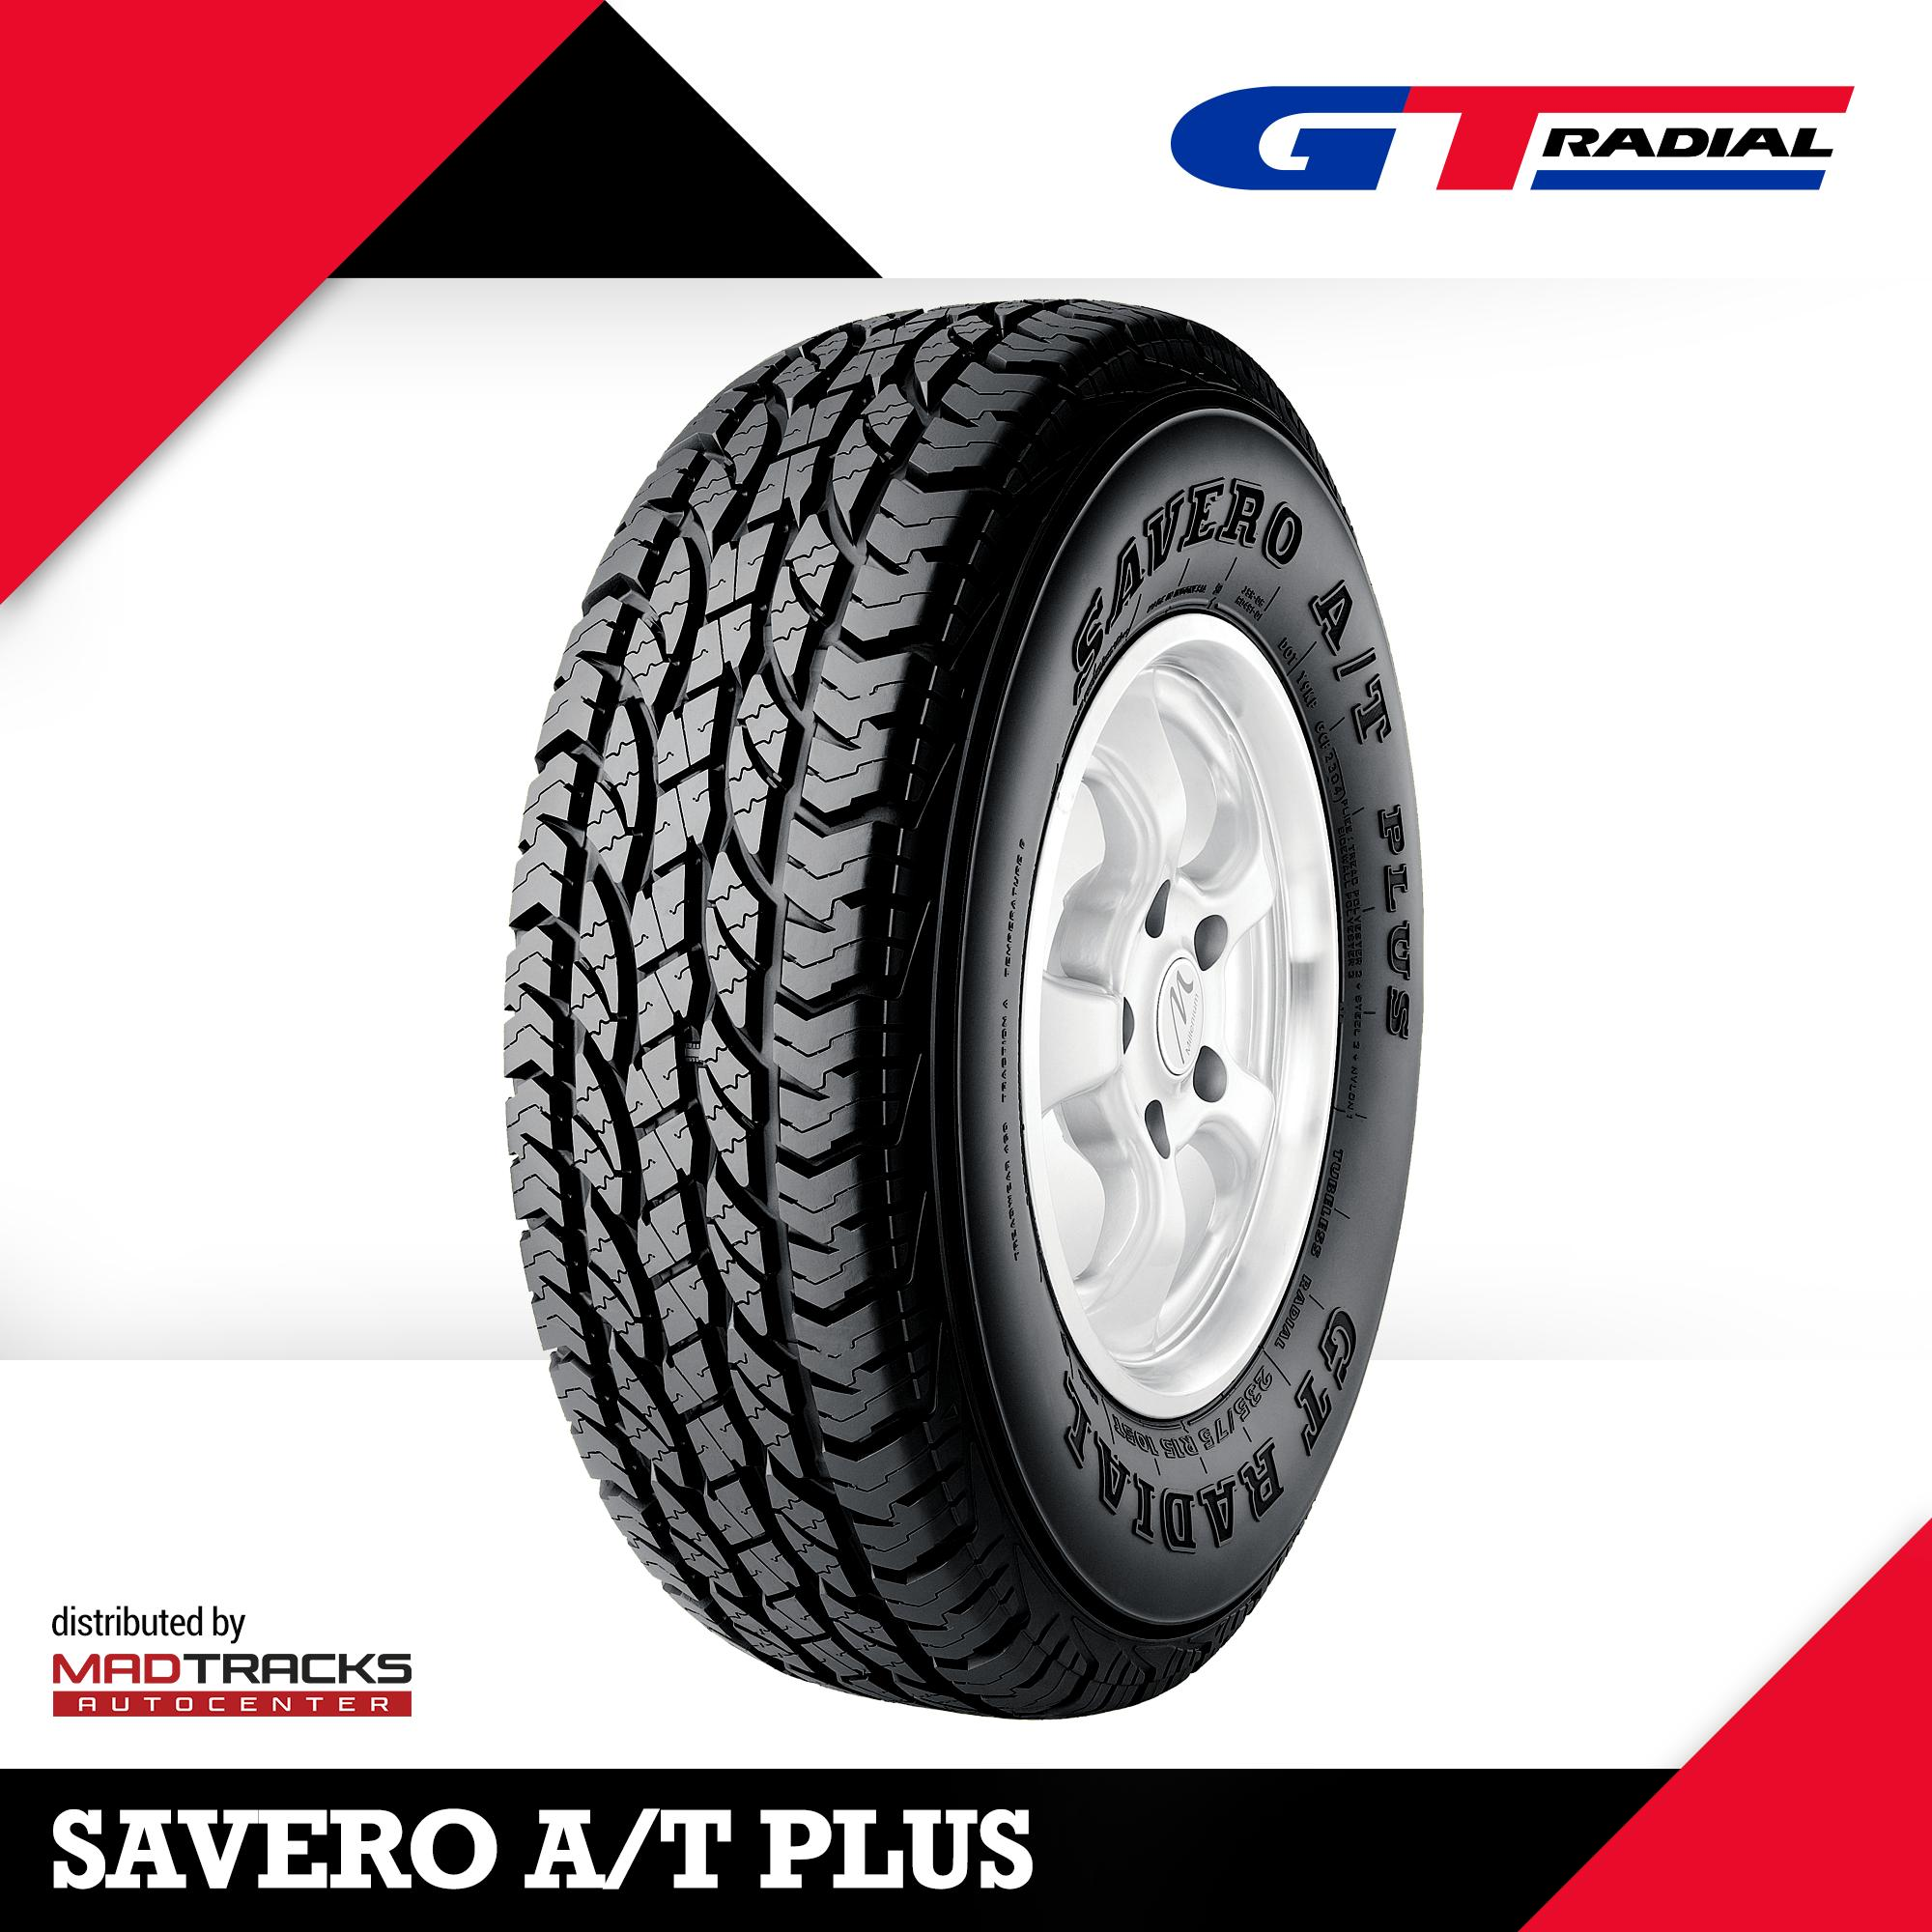 GT Radial 225/75 R16 104T SAVERO A/T Plus Tire